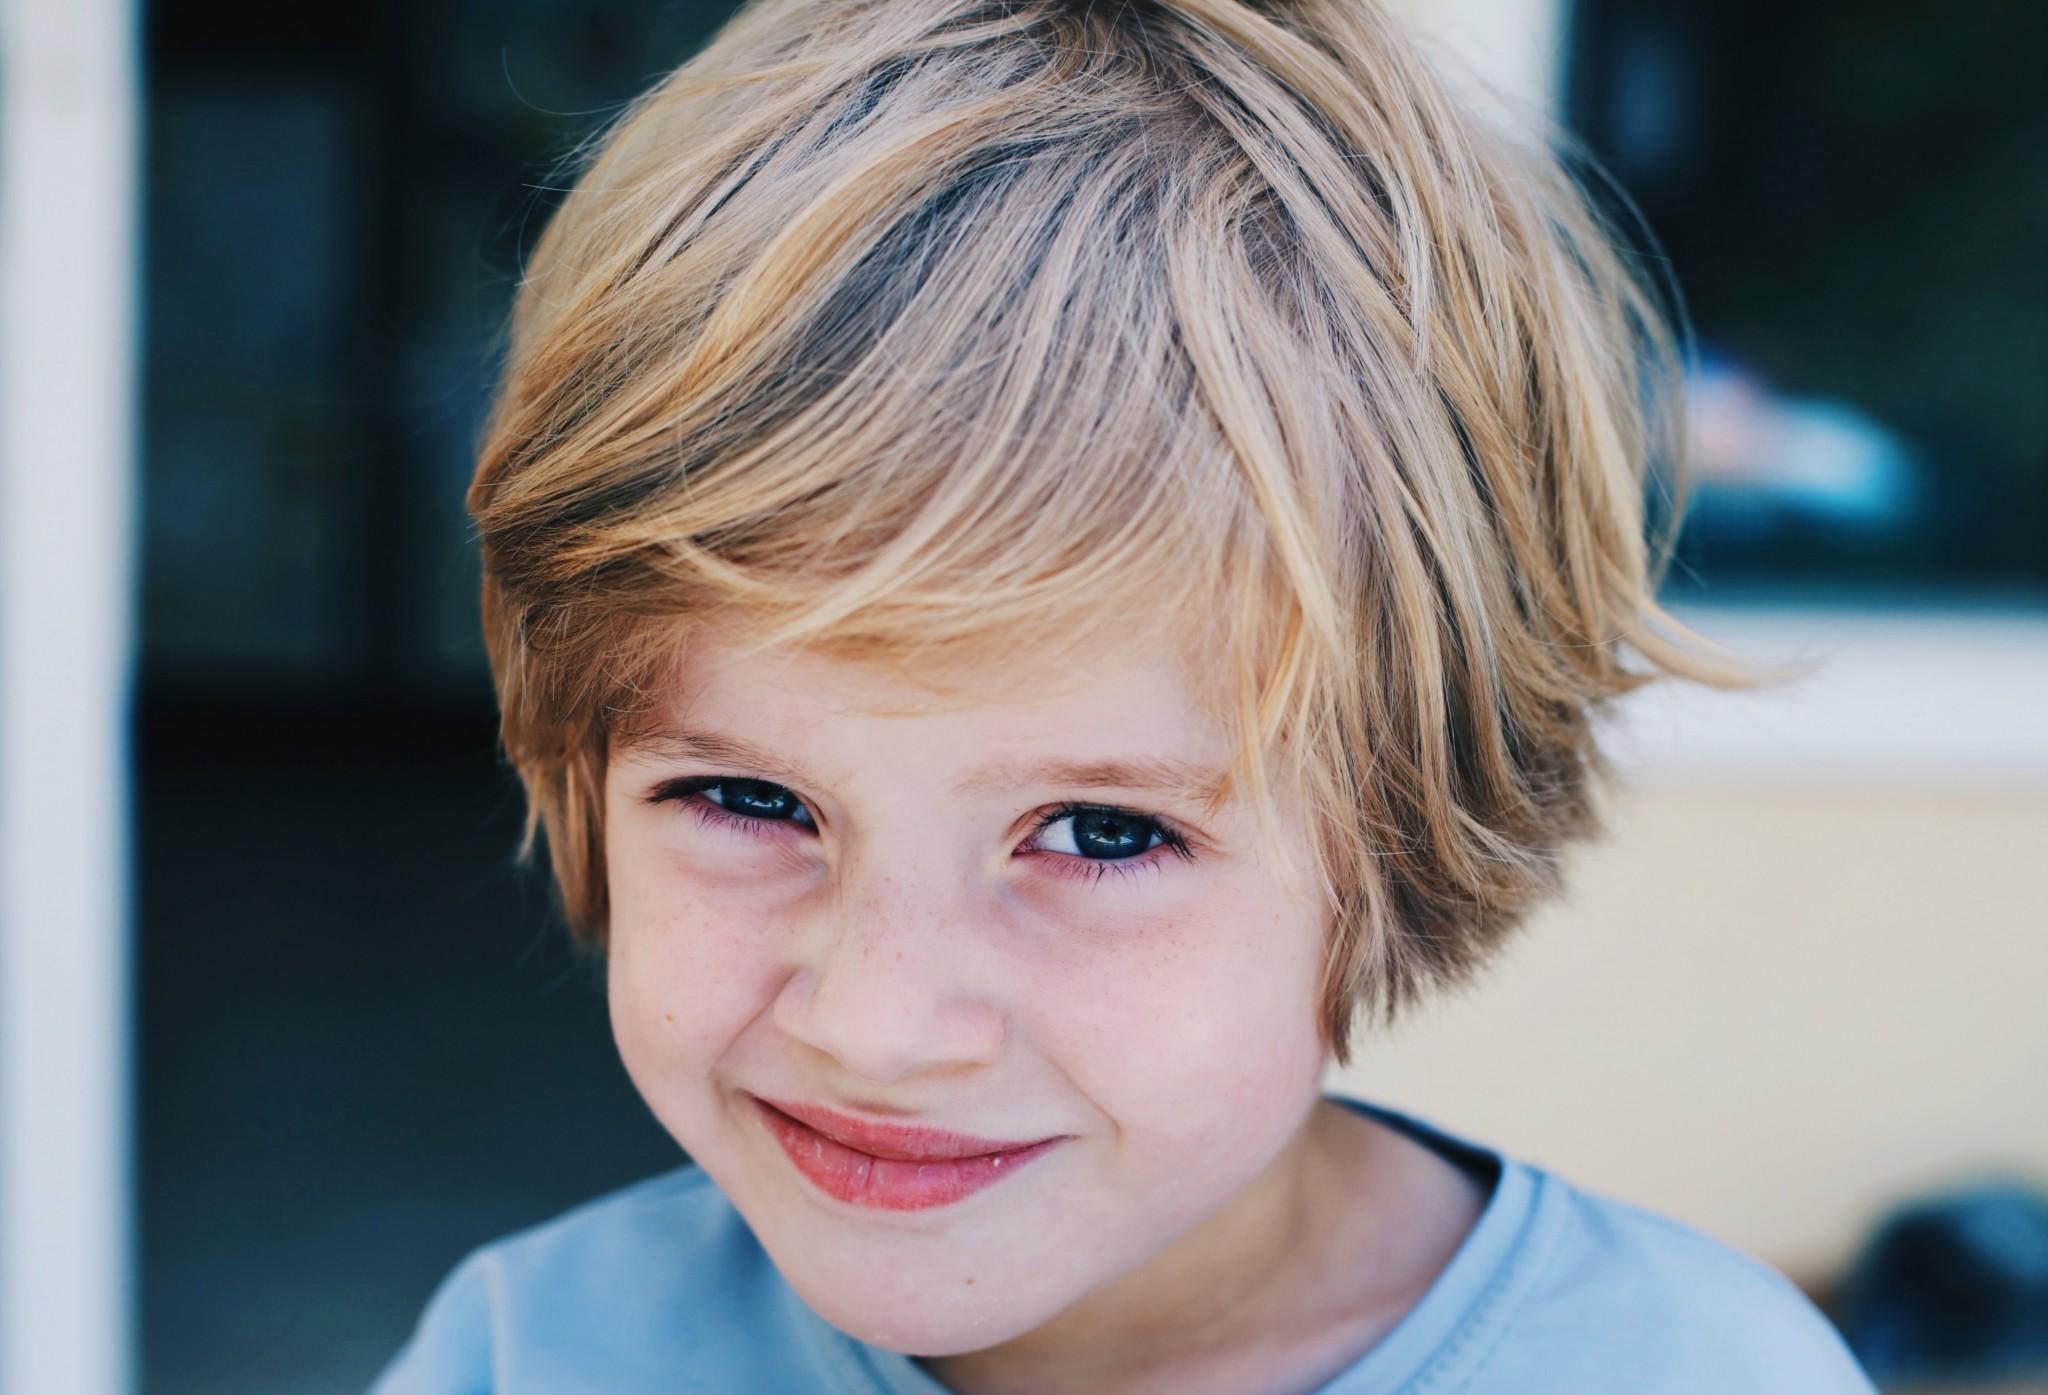 23/52 Madelon. 52 project. Each kid. One photo. Every week.